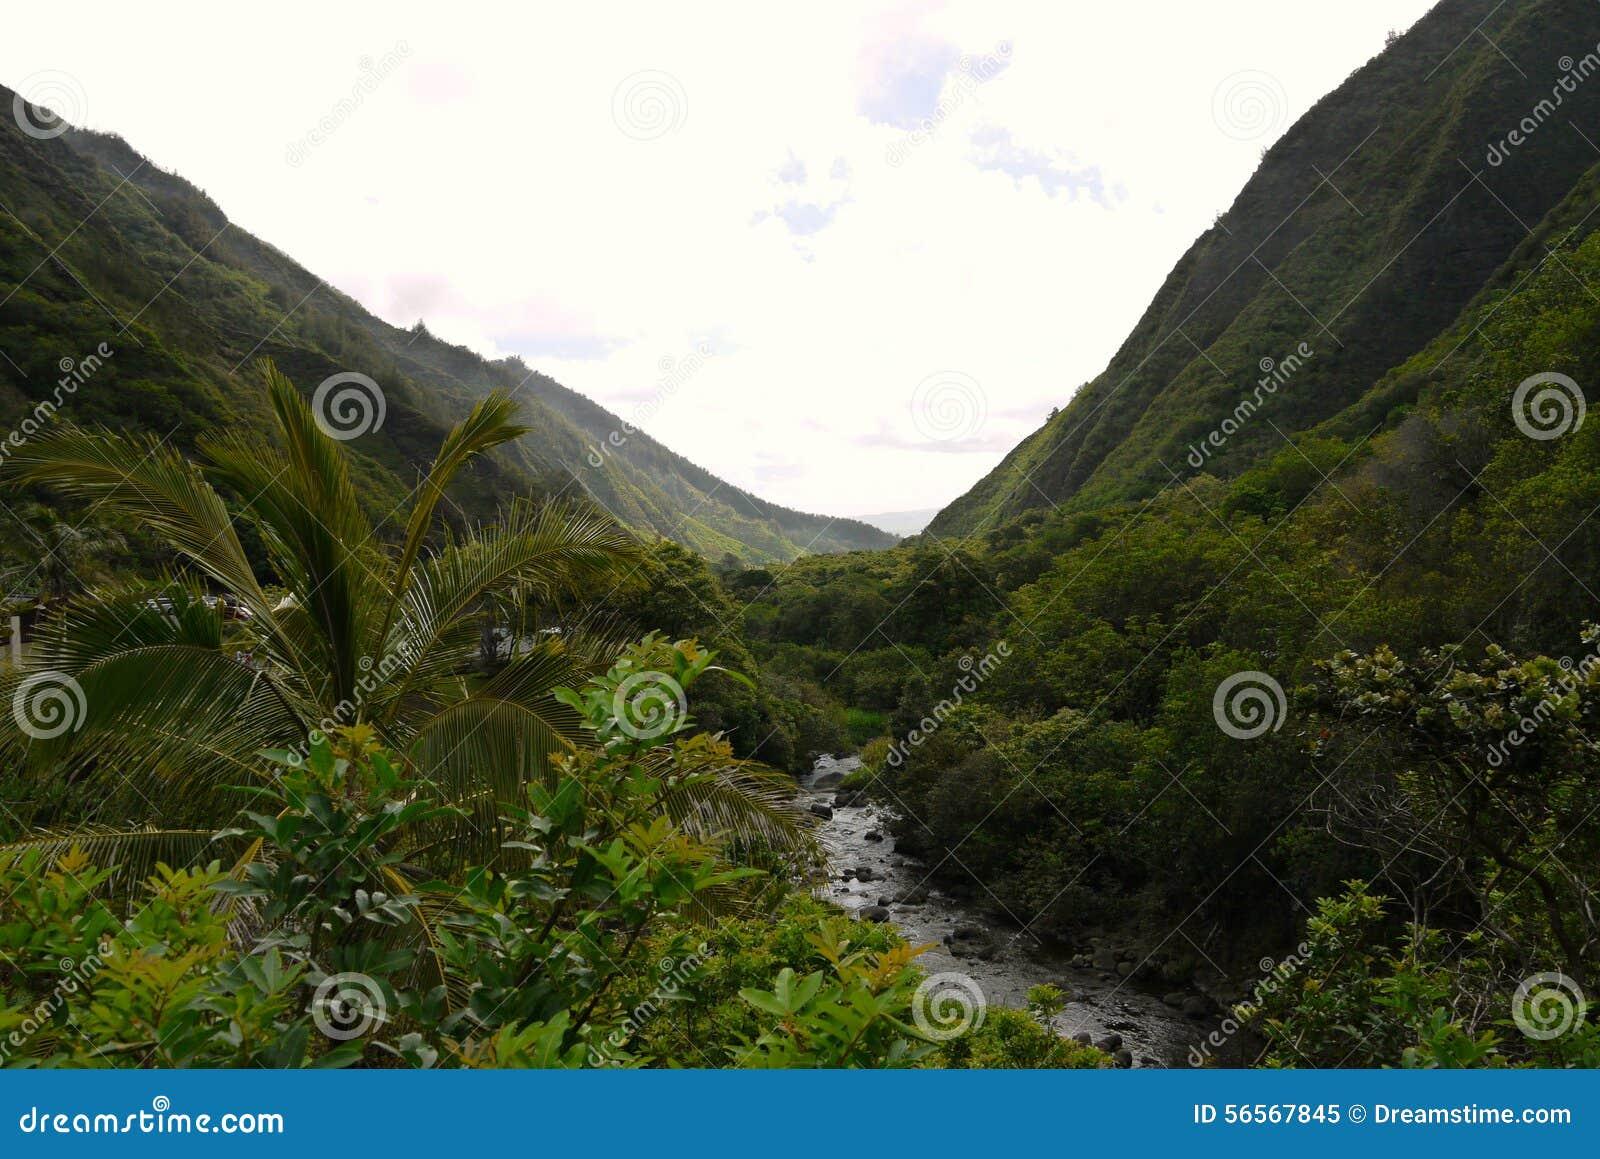 Download της Χαβάης τοπίο στοκ εικόνα. εικόνα από hawaiian, έξυπνο - 56567845